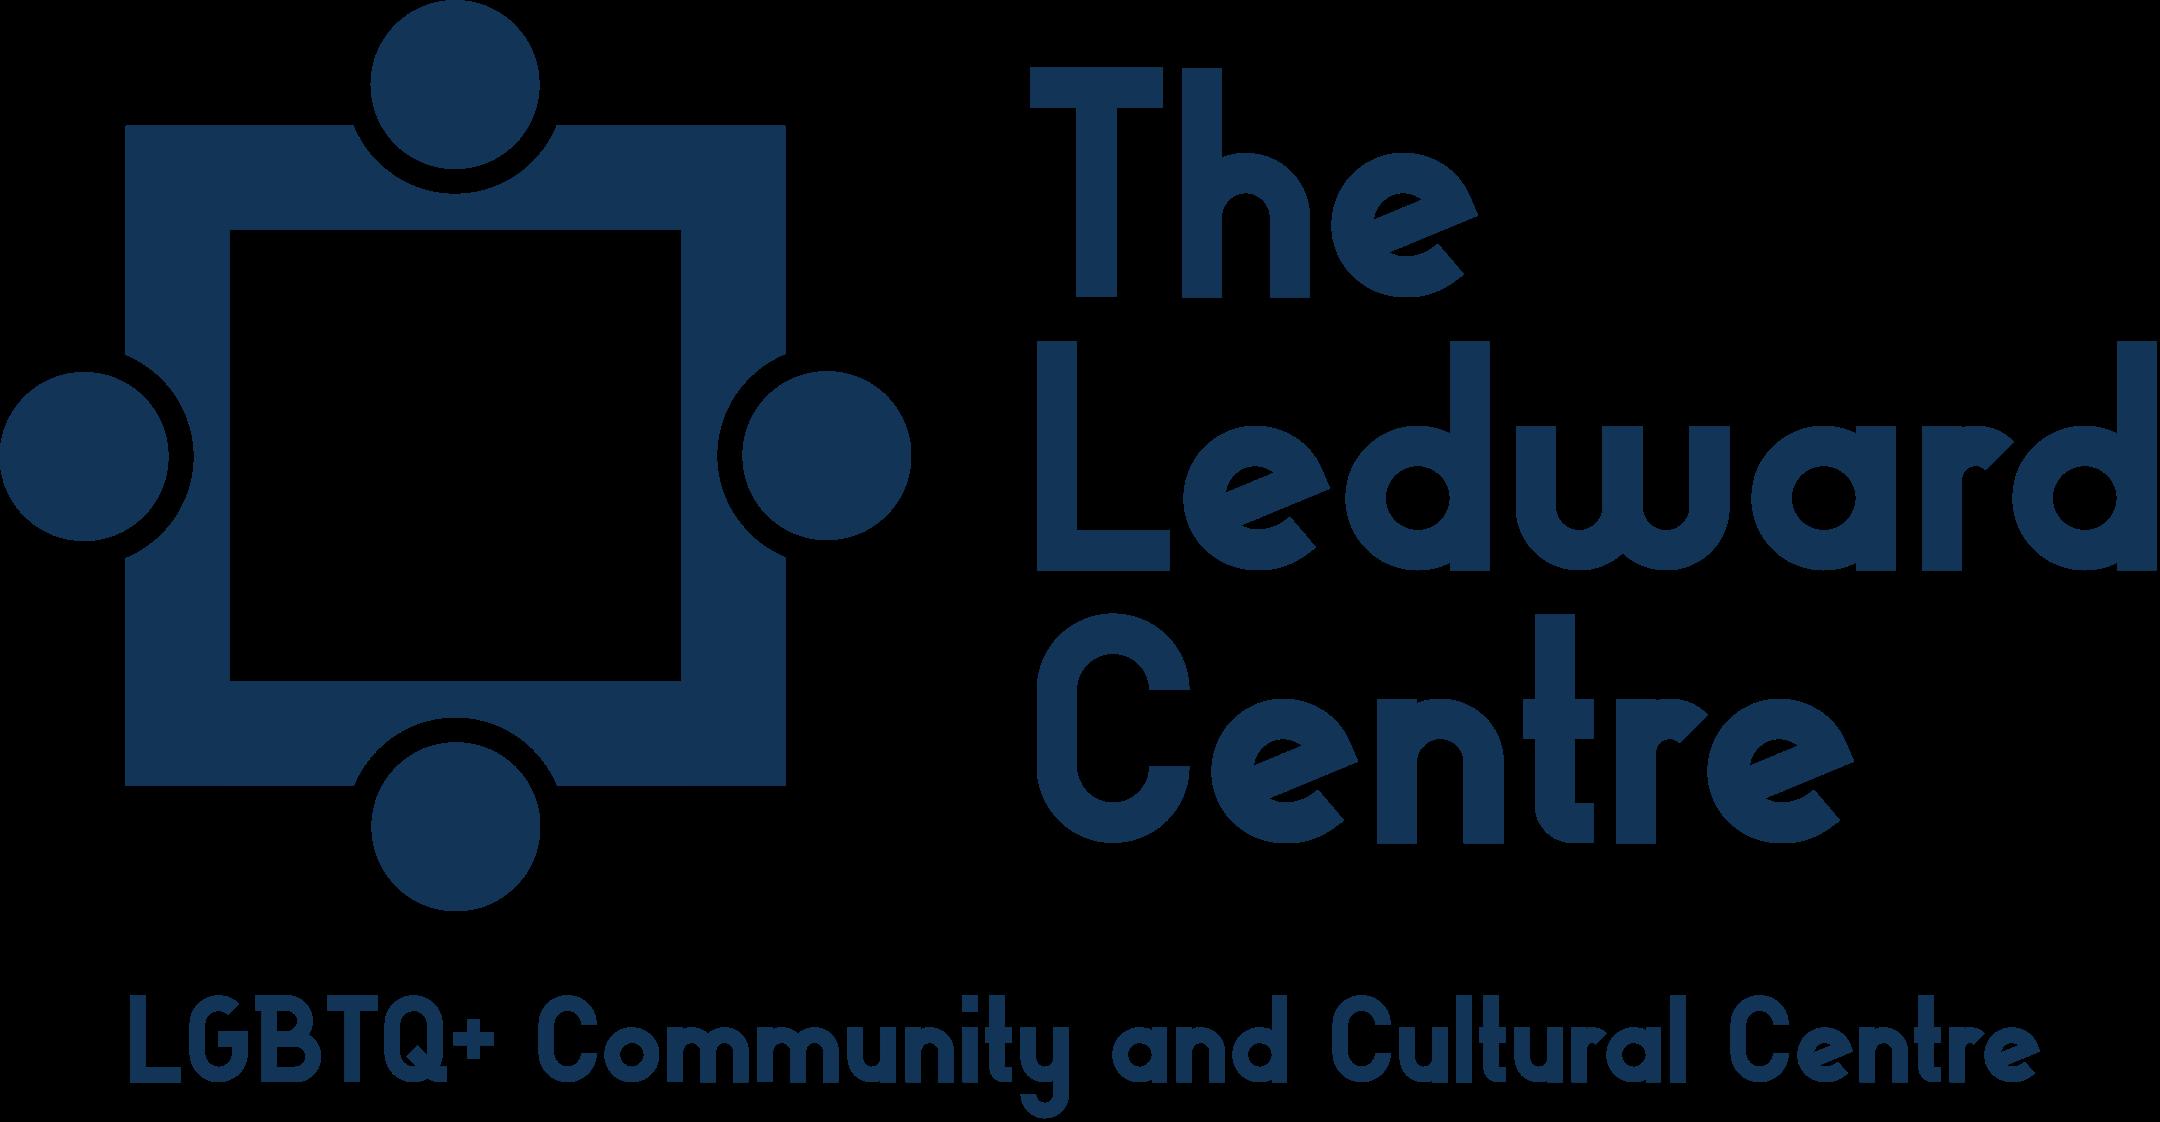 The Ledward Centre, LGBTQ+ Community and Cultural Centre